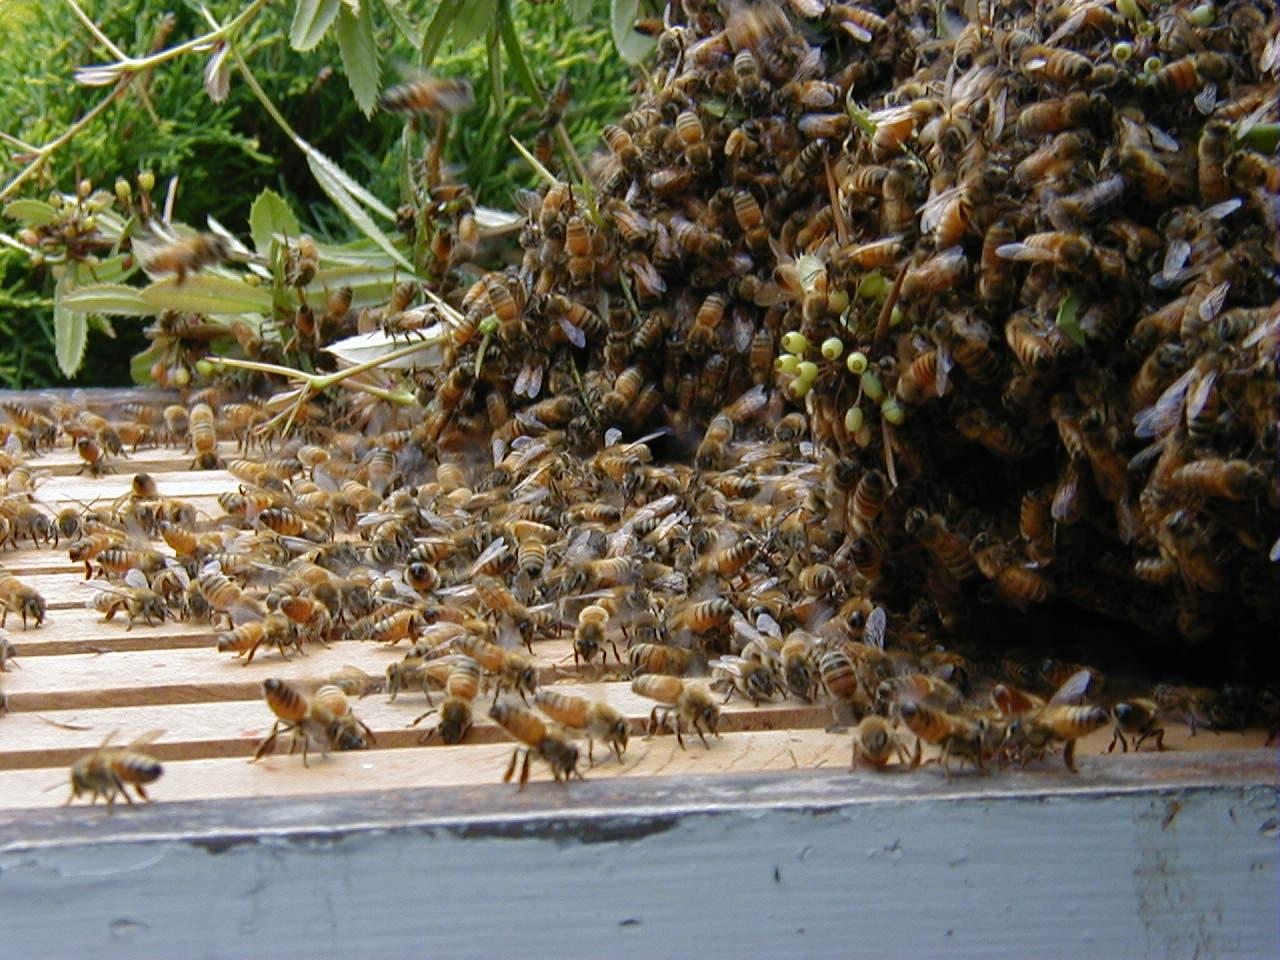 Top of hive box